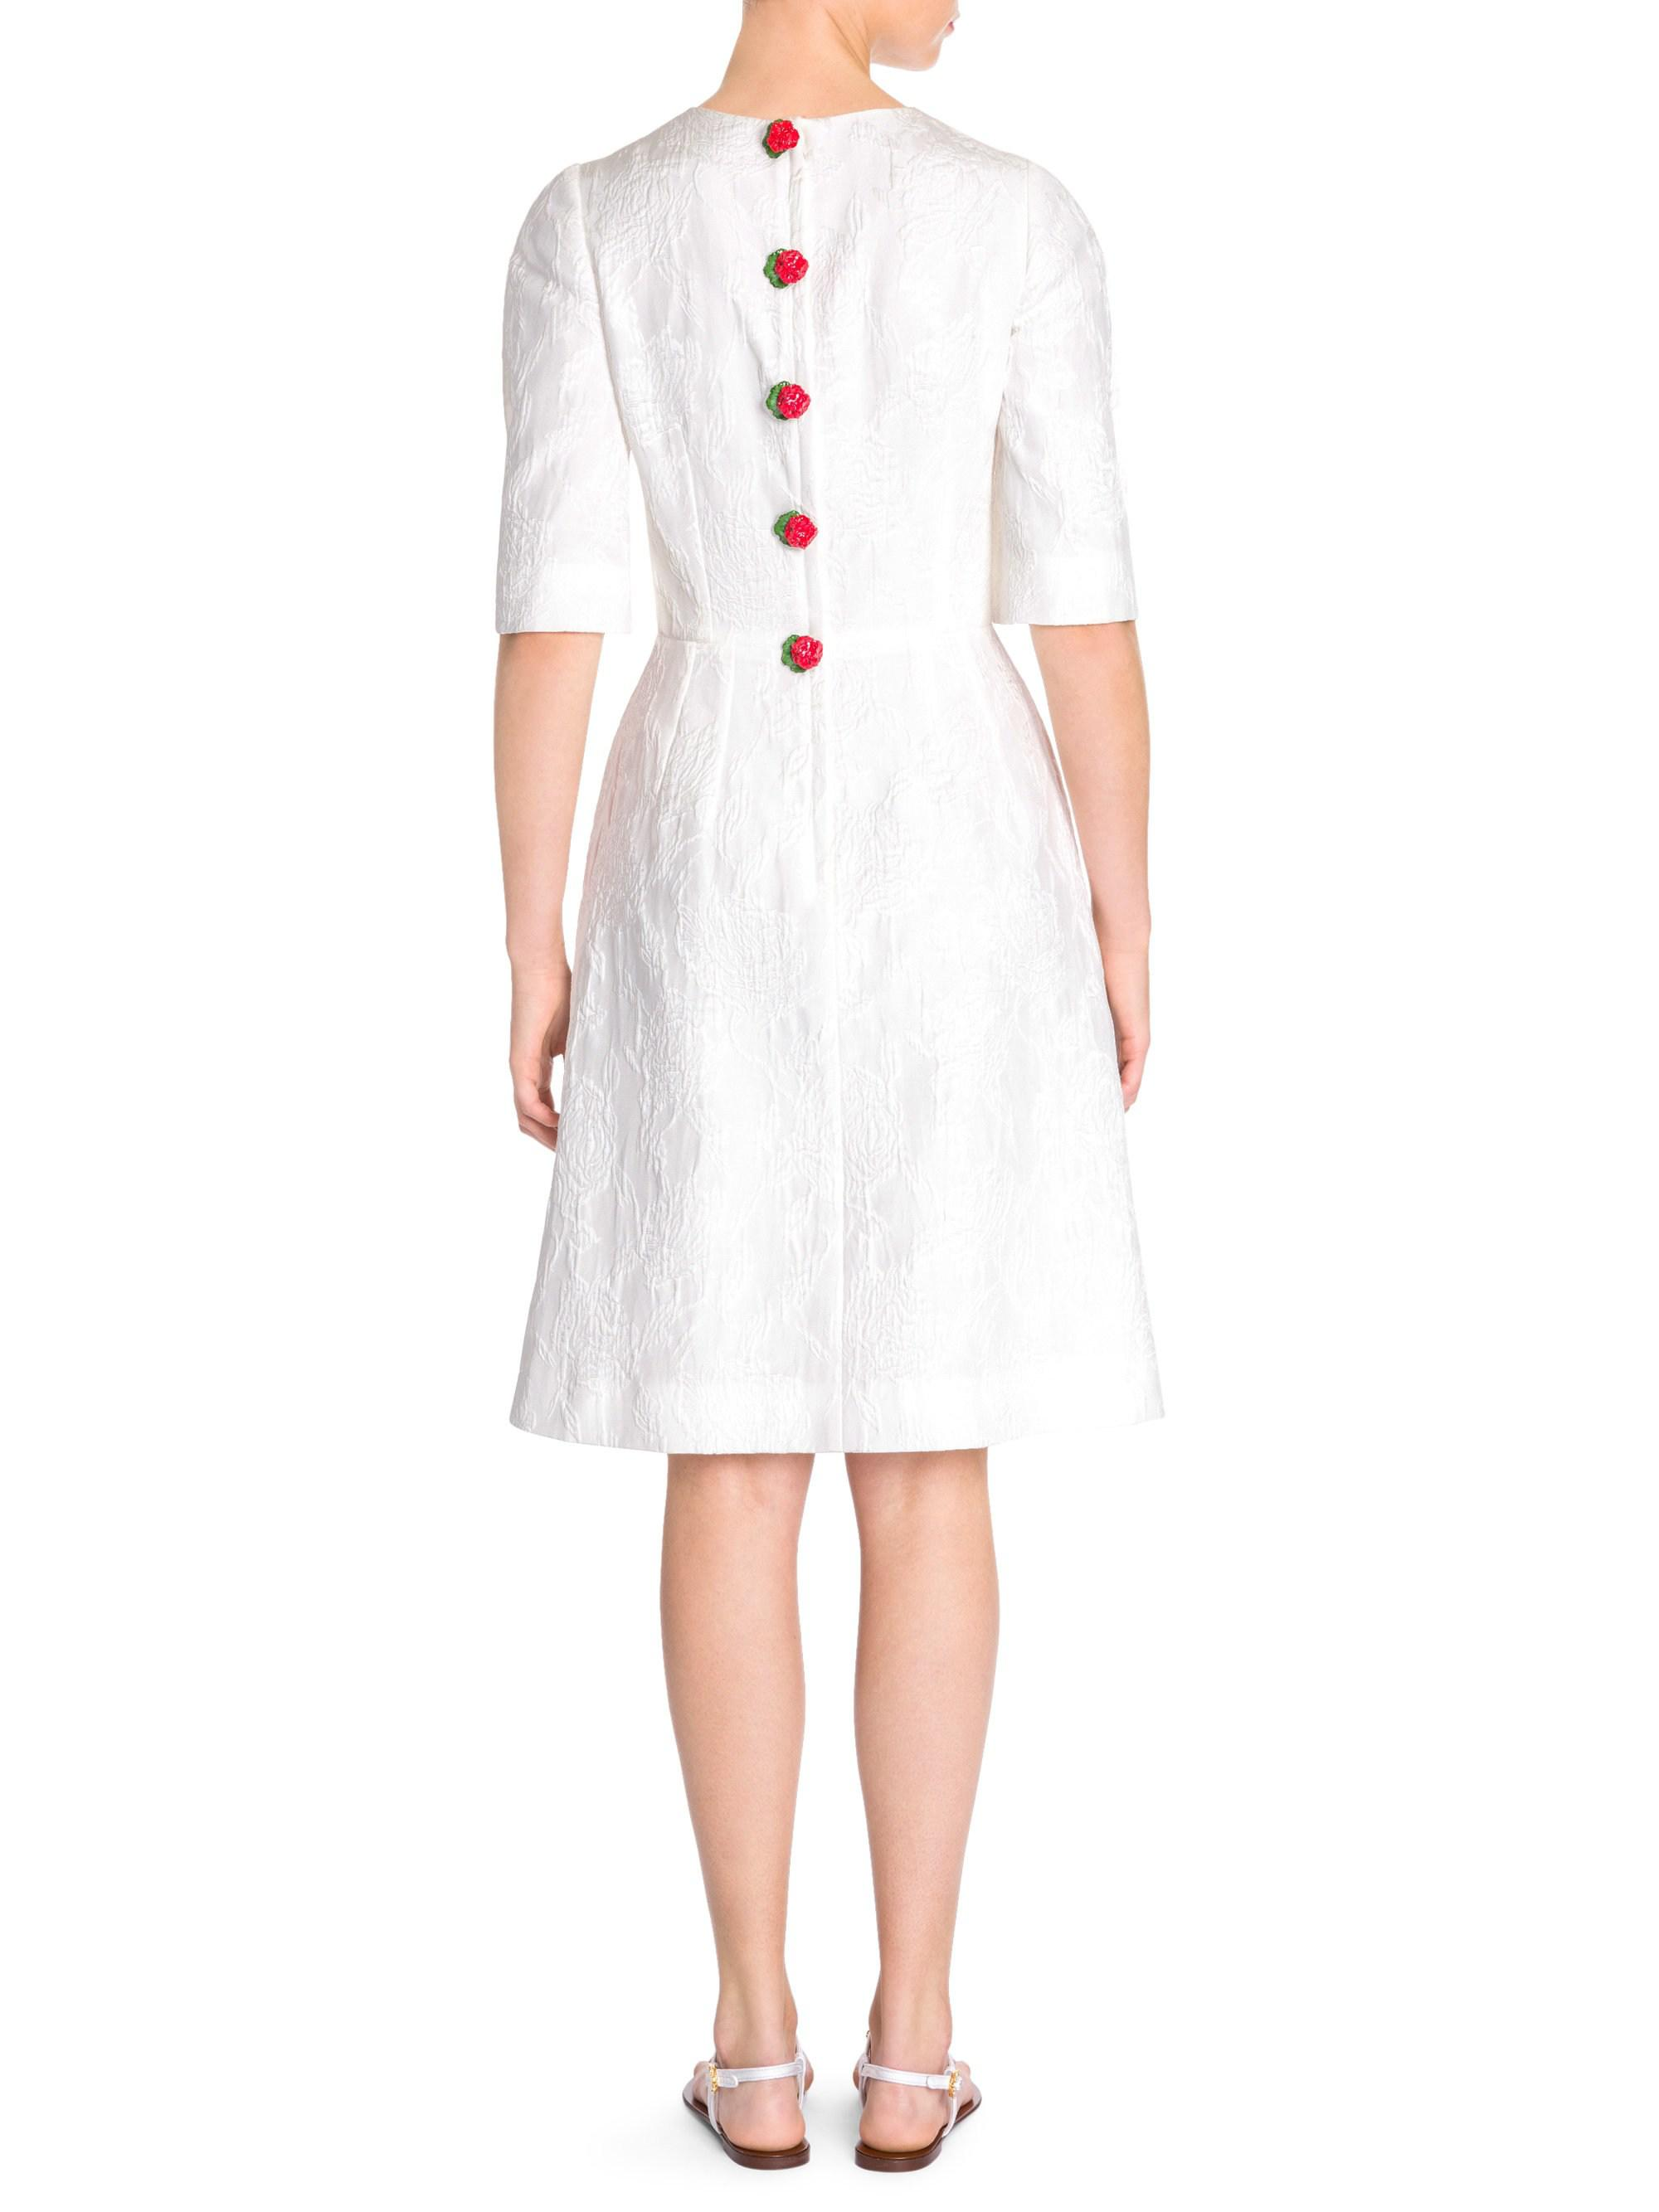 40d41069b23 Lyst - Dolce   Gabbana Jacquard Rose Button Dress in White